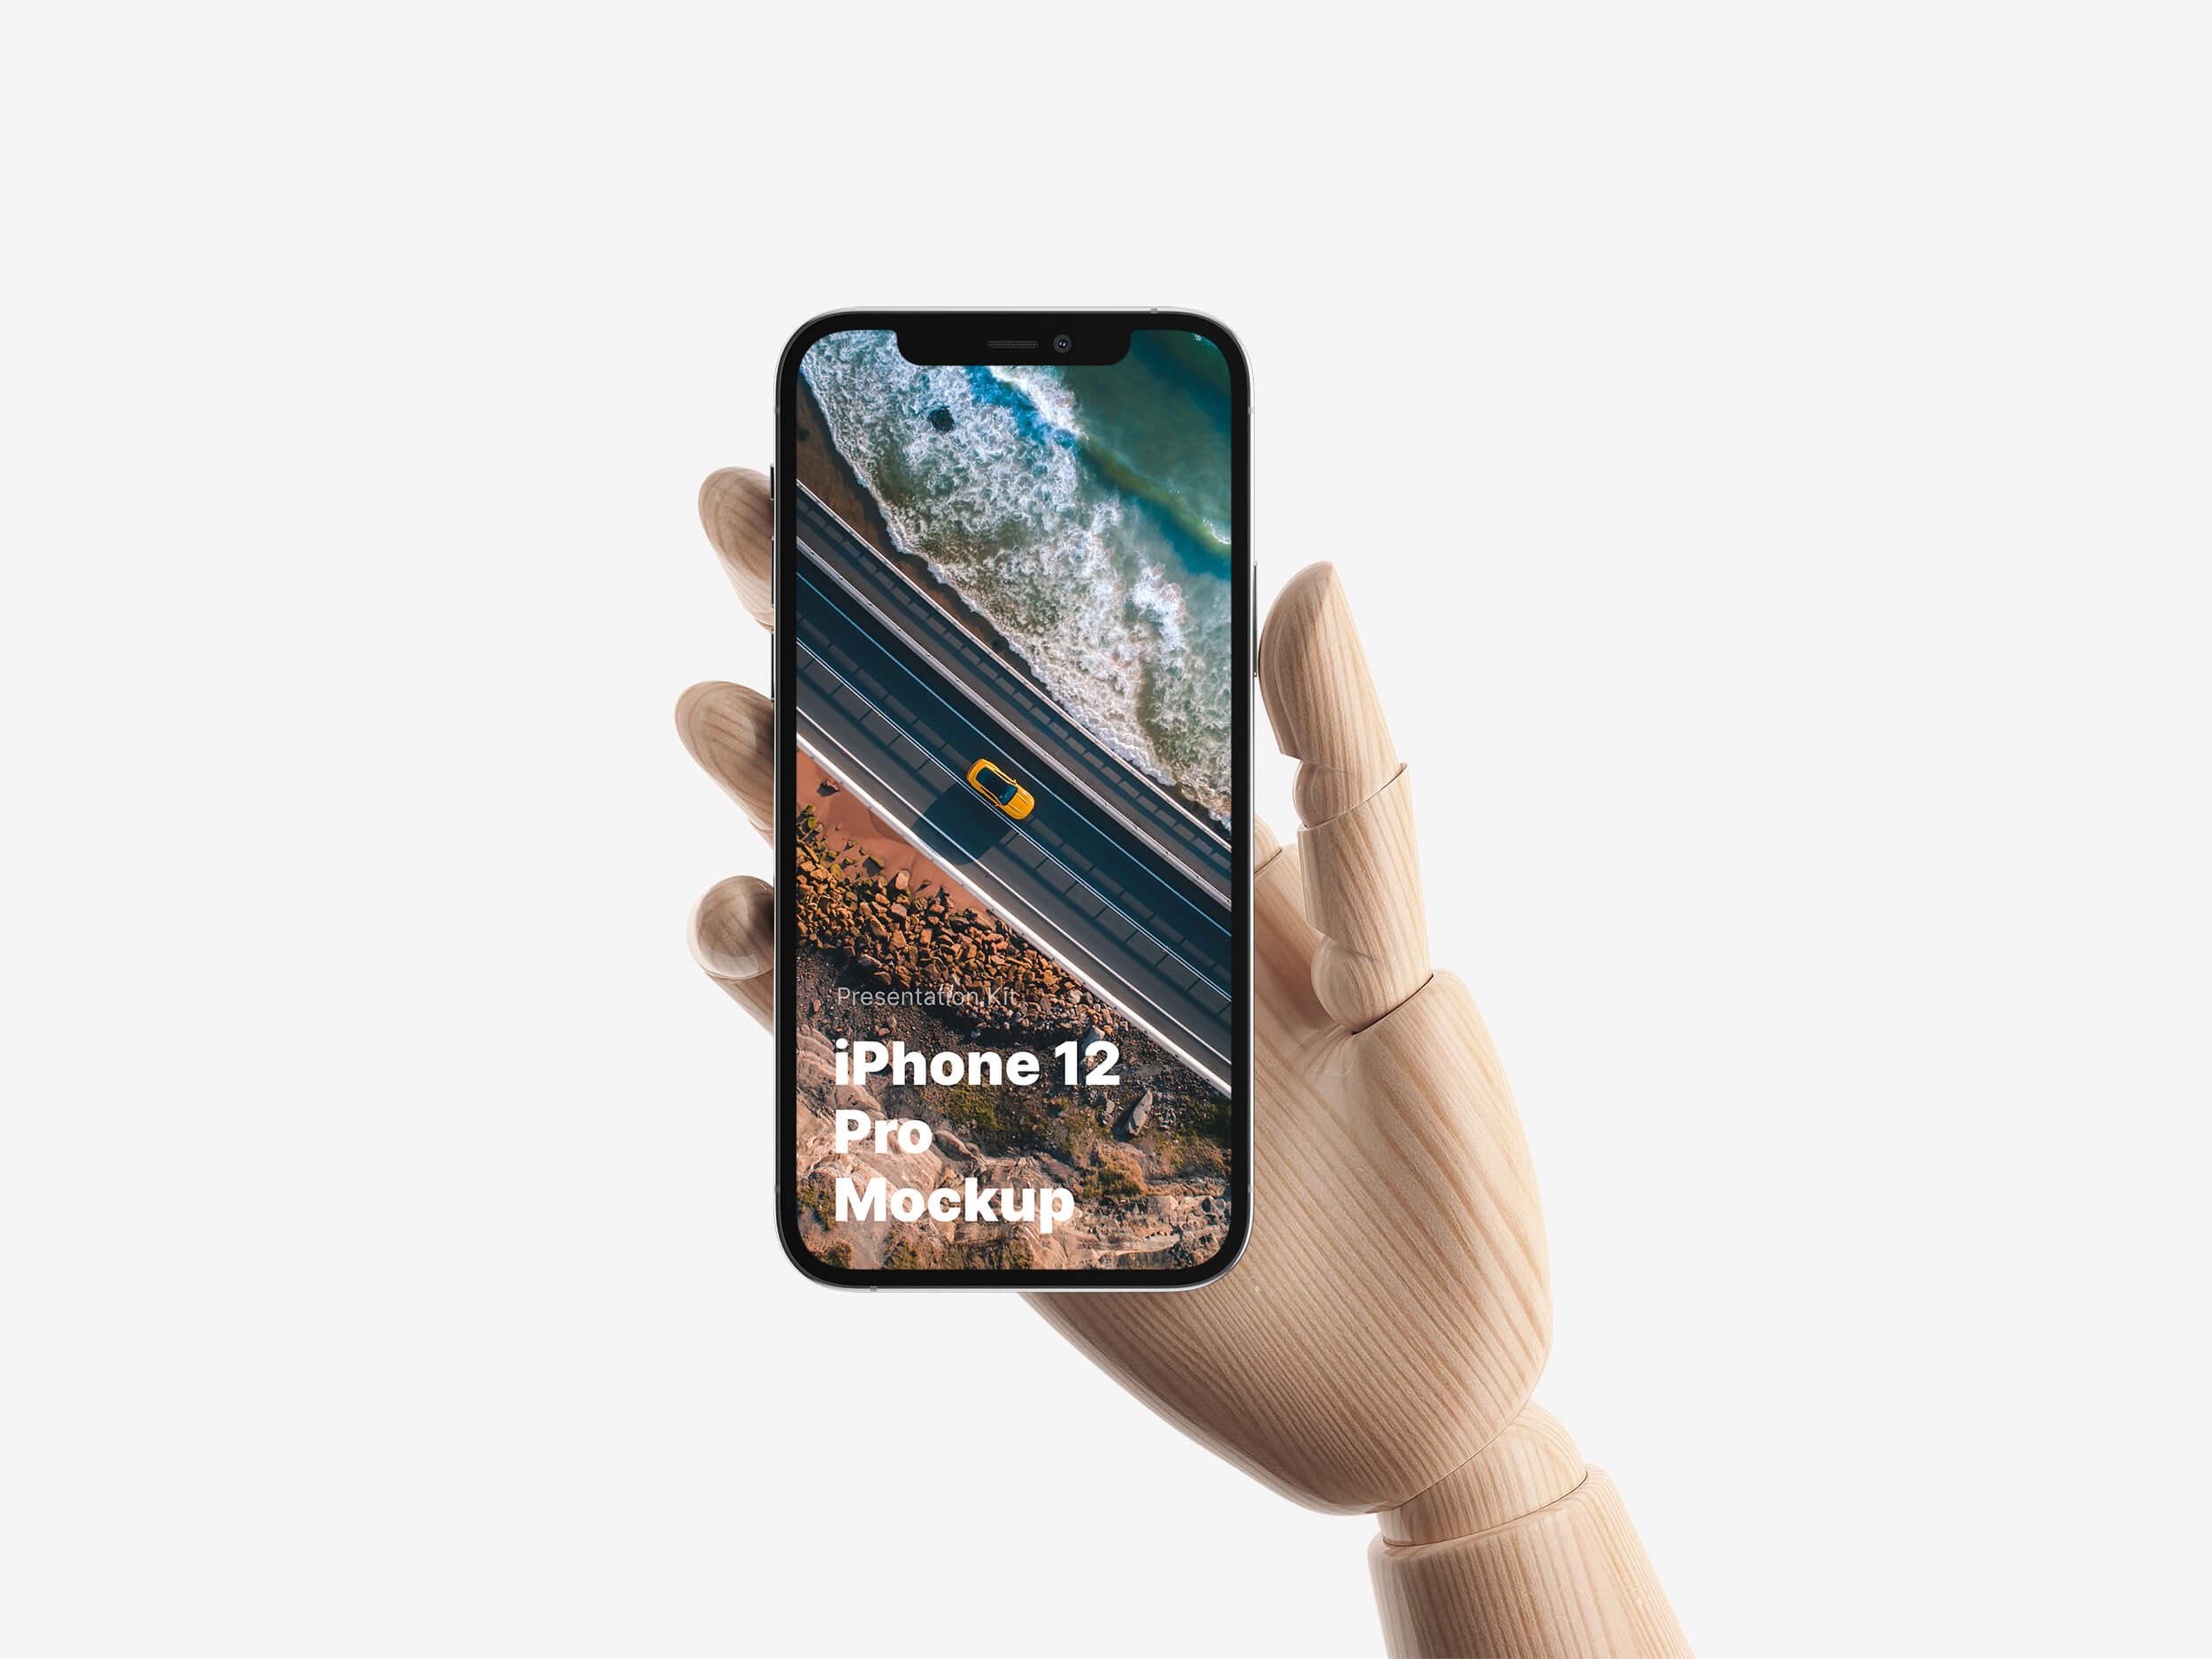 Wooden Hands iPhone 12 Pro Mockup